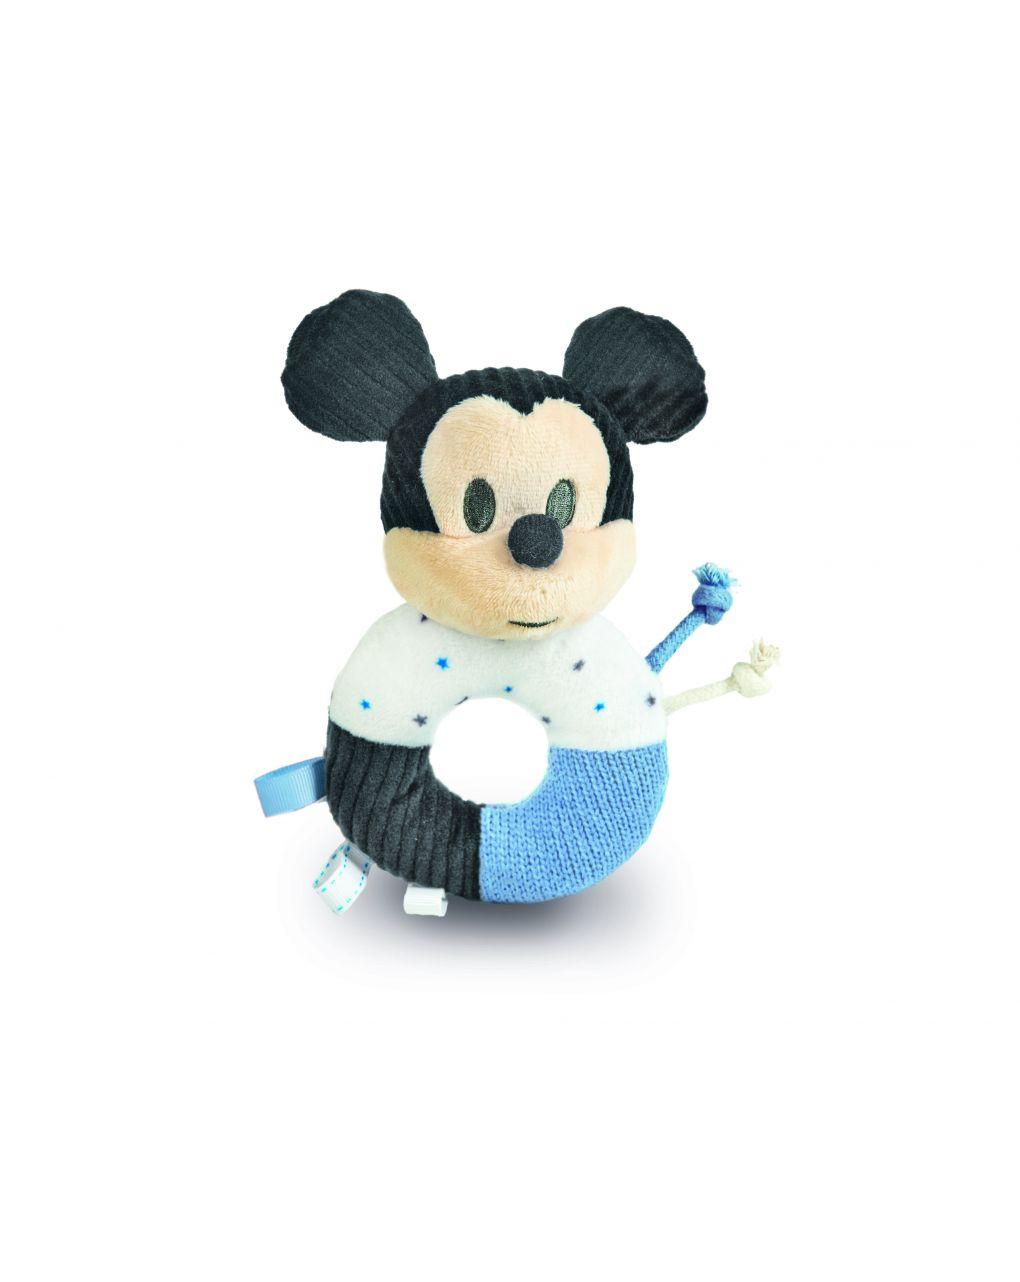 Bebê disney - anel de chocalho macio mickey bebê - Clementoni